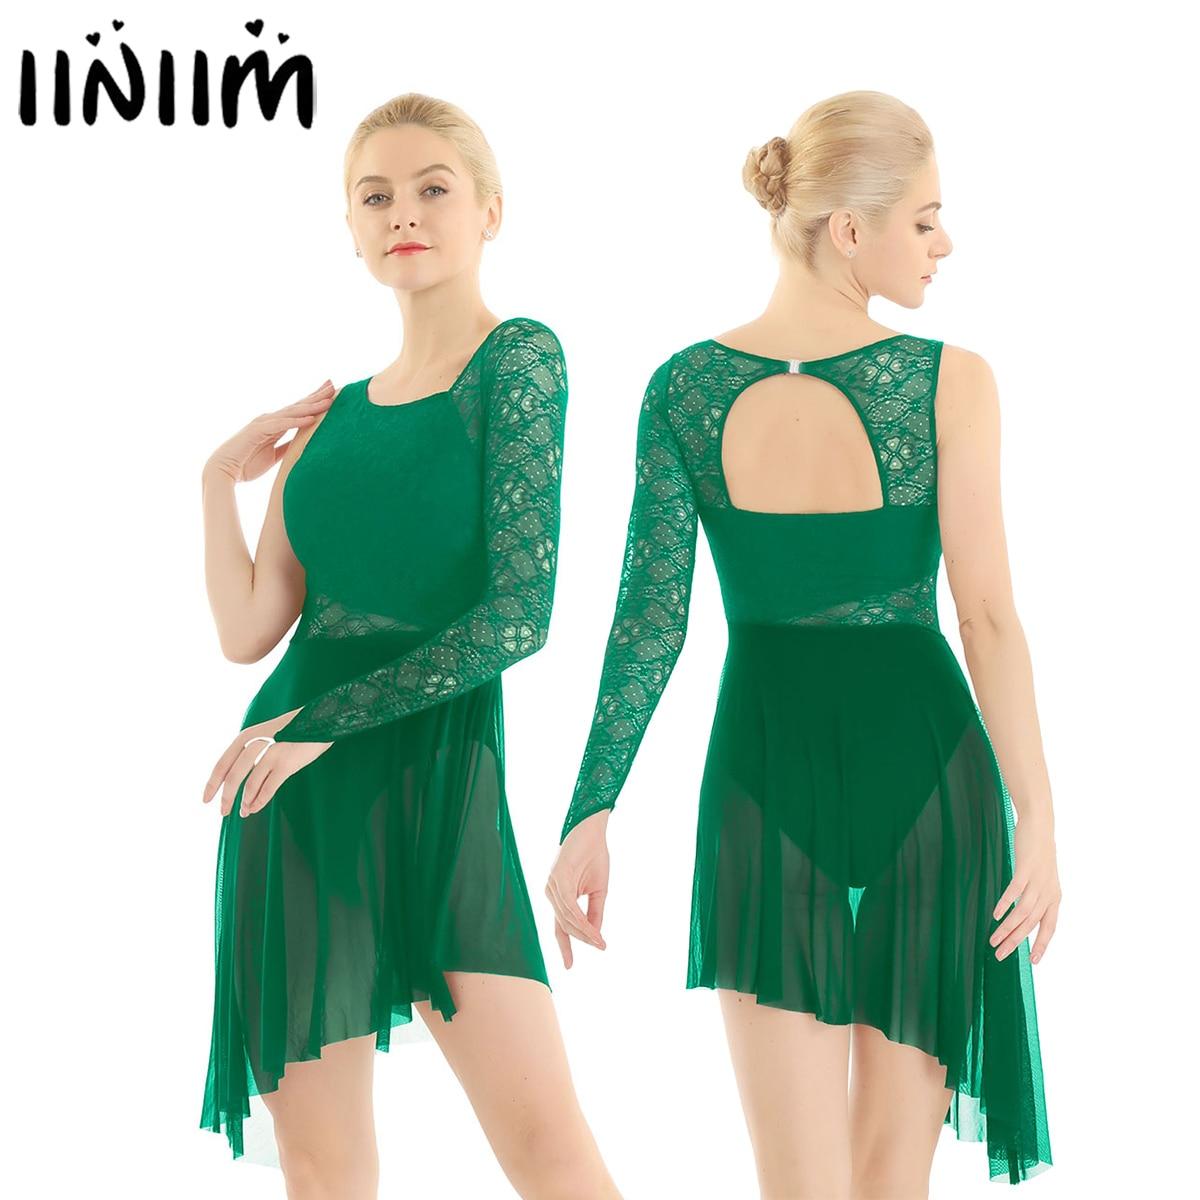 Women Ballet Leotard Dress Single With Fingertip Lace Bodice Lyrical Modern Dance Wear Femme Adult Asymmetric Gymnastics Costume